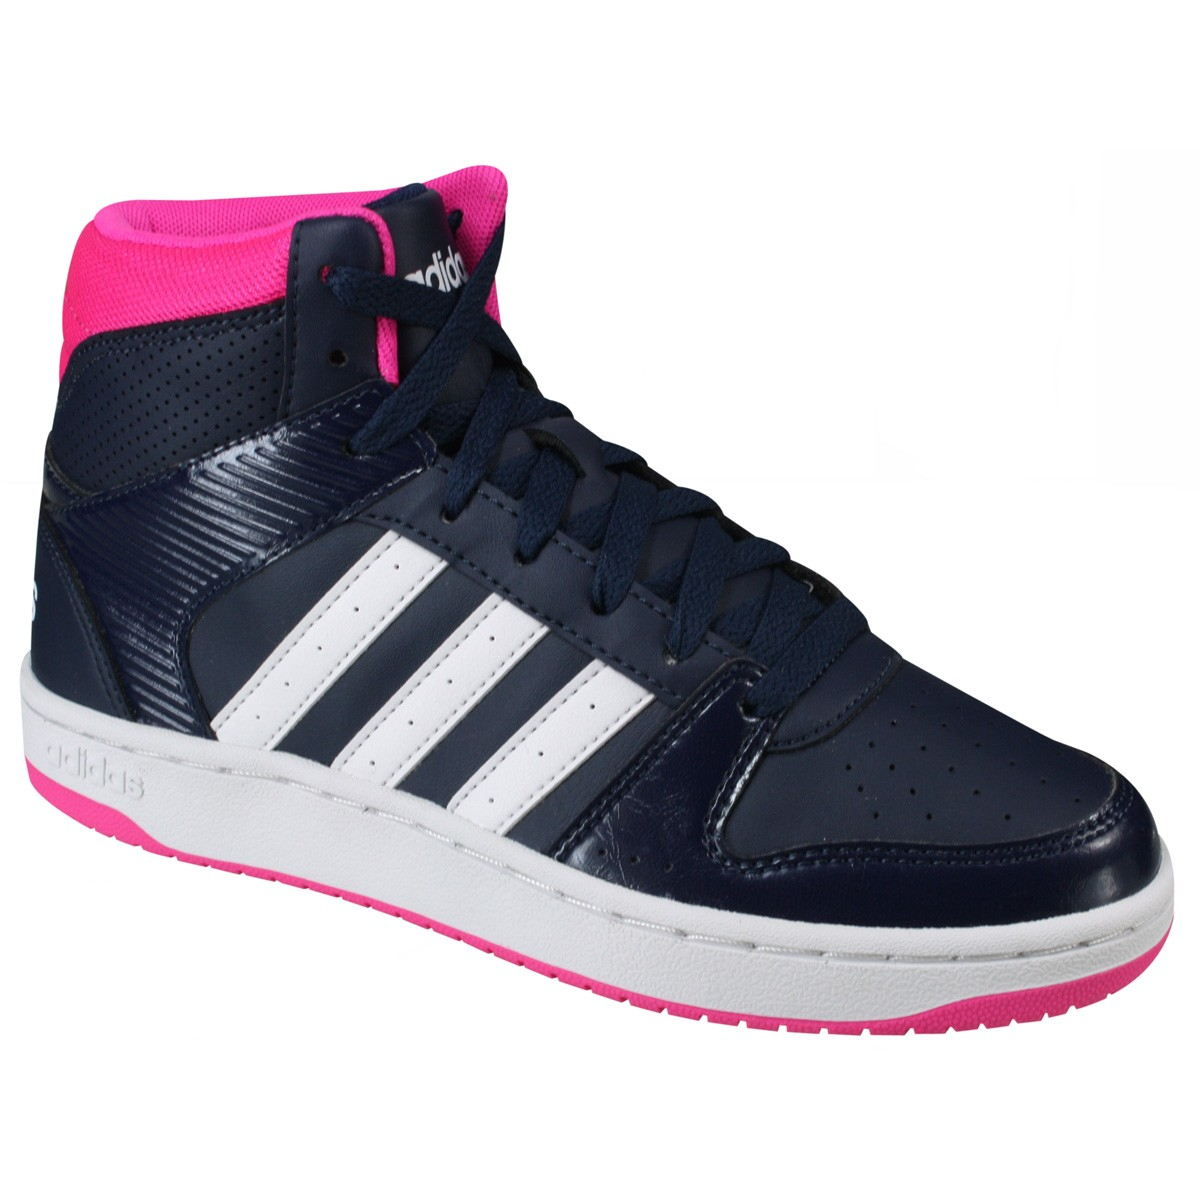 2b1616a2cbcdd Tênis Adidas VS Hoopster MID W AW4763 Marinho Rosa